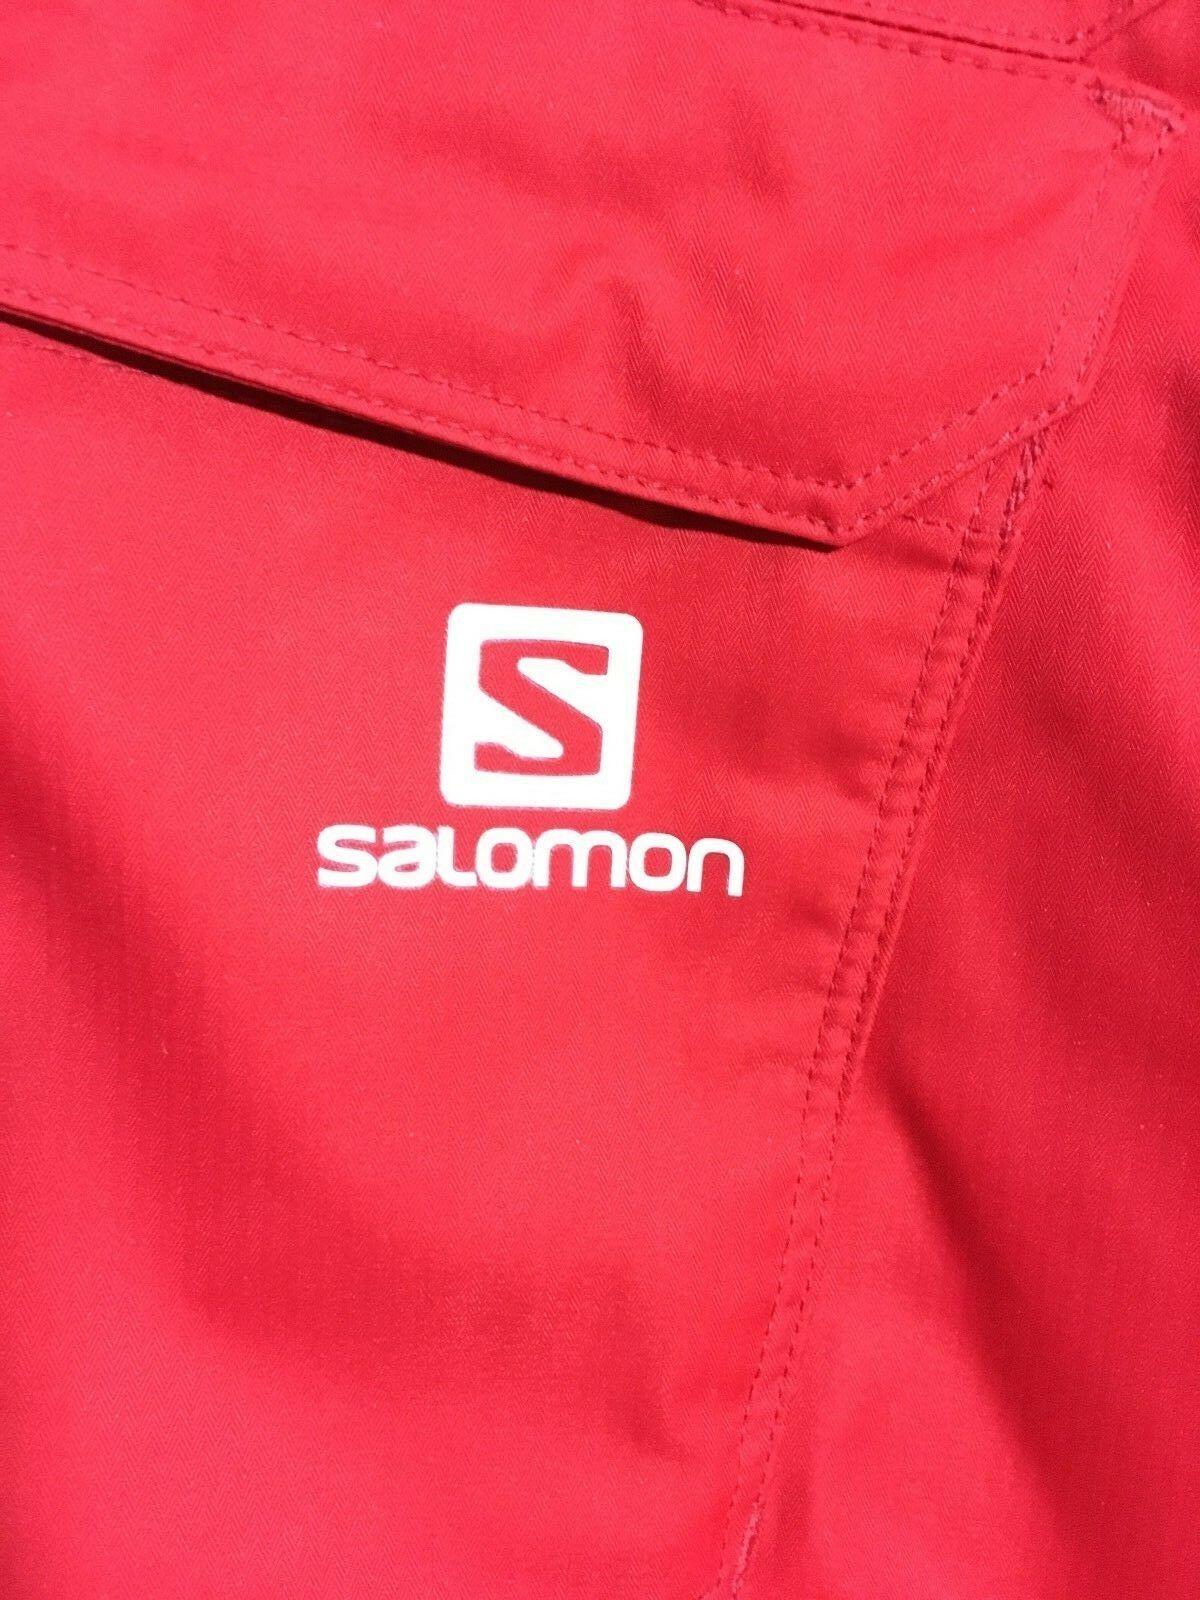 Salomon Response Ski Snowboard Pants Unisex, Size XS or S, Red, NEW image 9